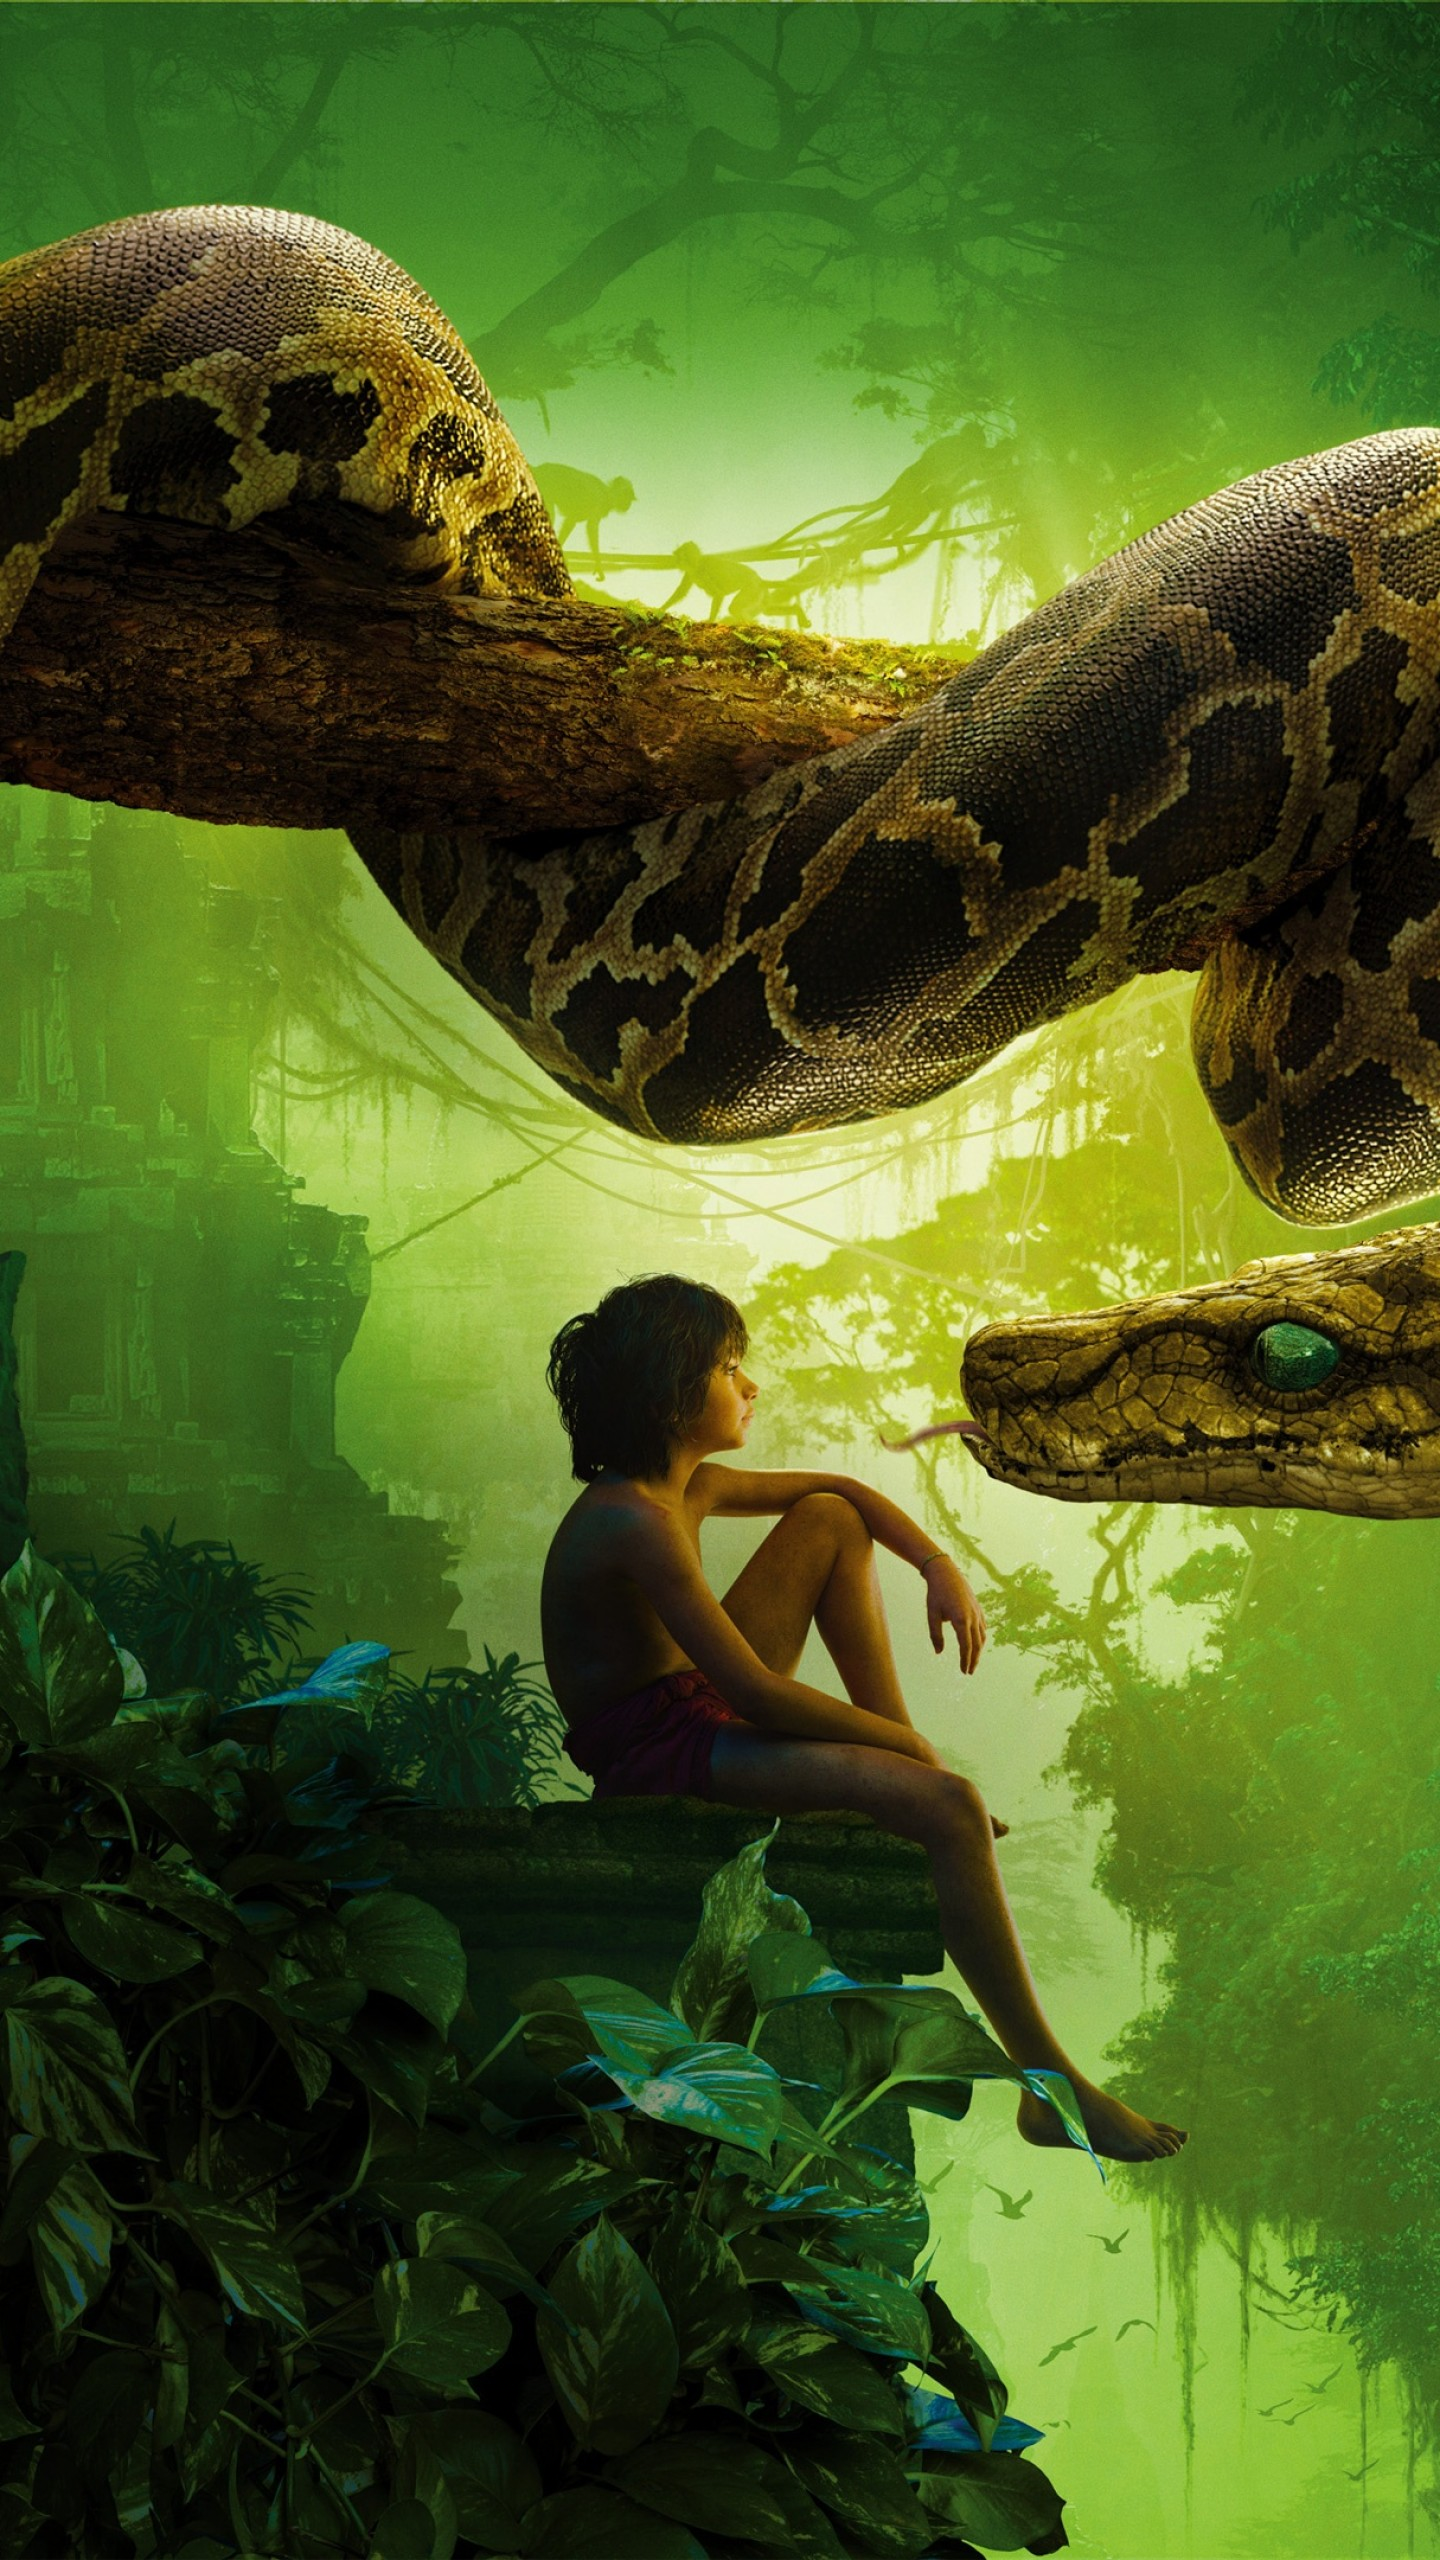 Wallpaper The Jungle Book, snake kaa, mowgli, Best movies